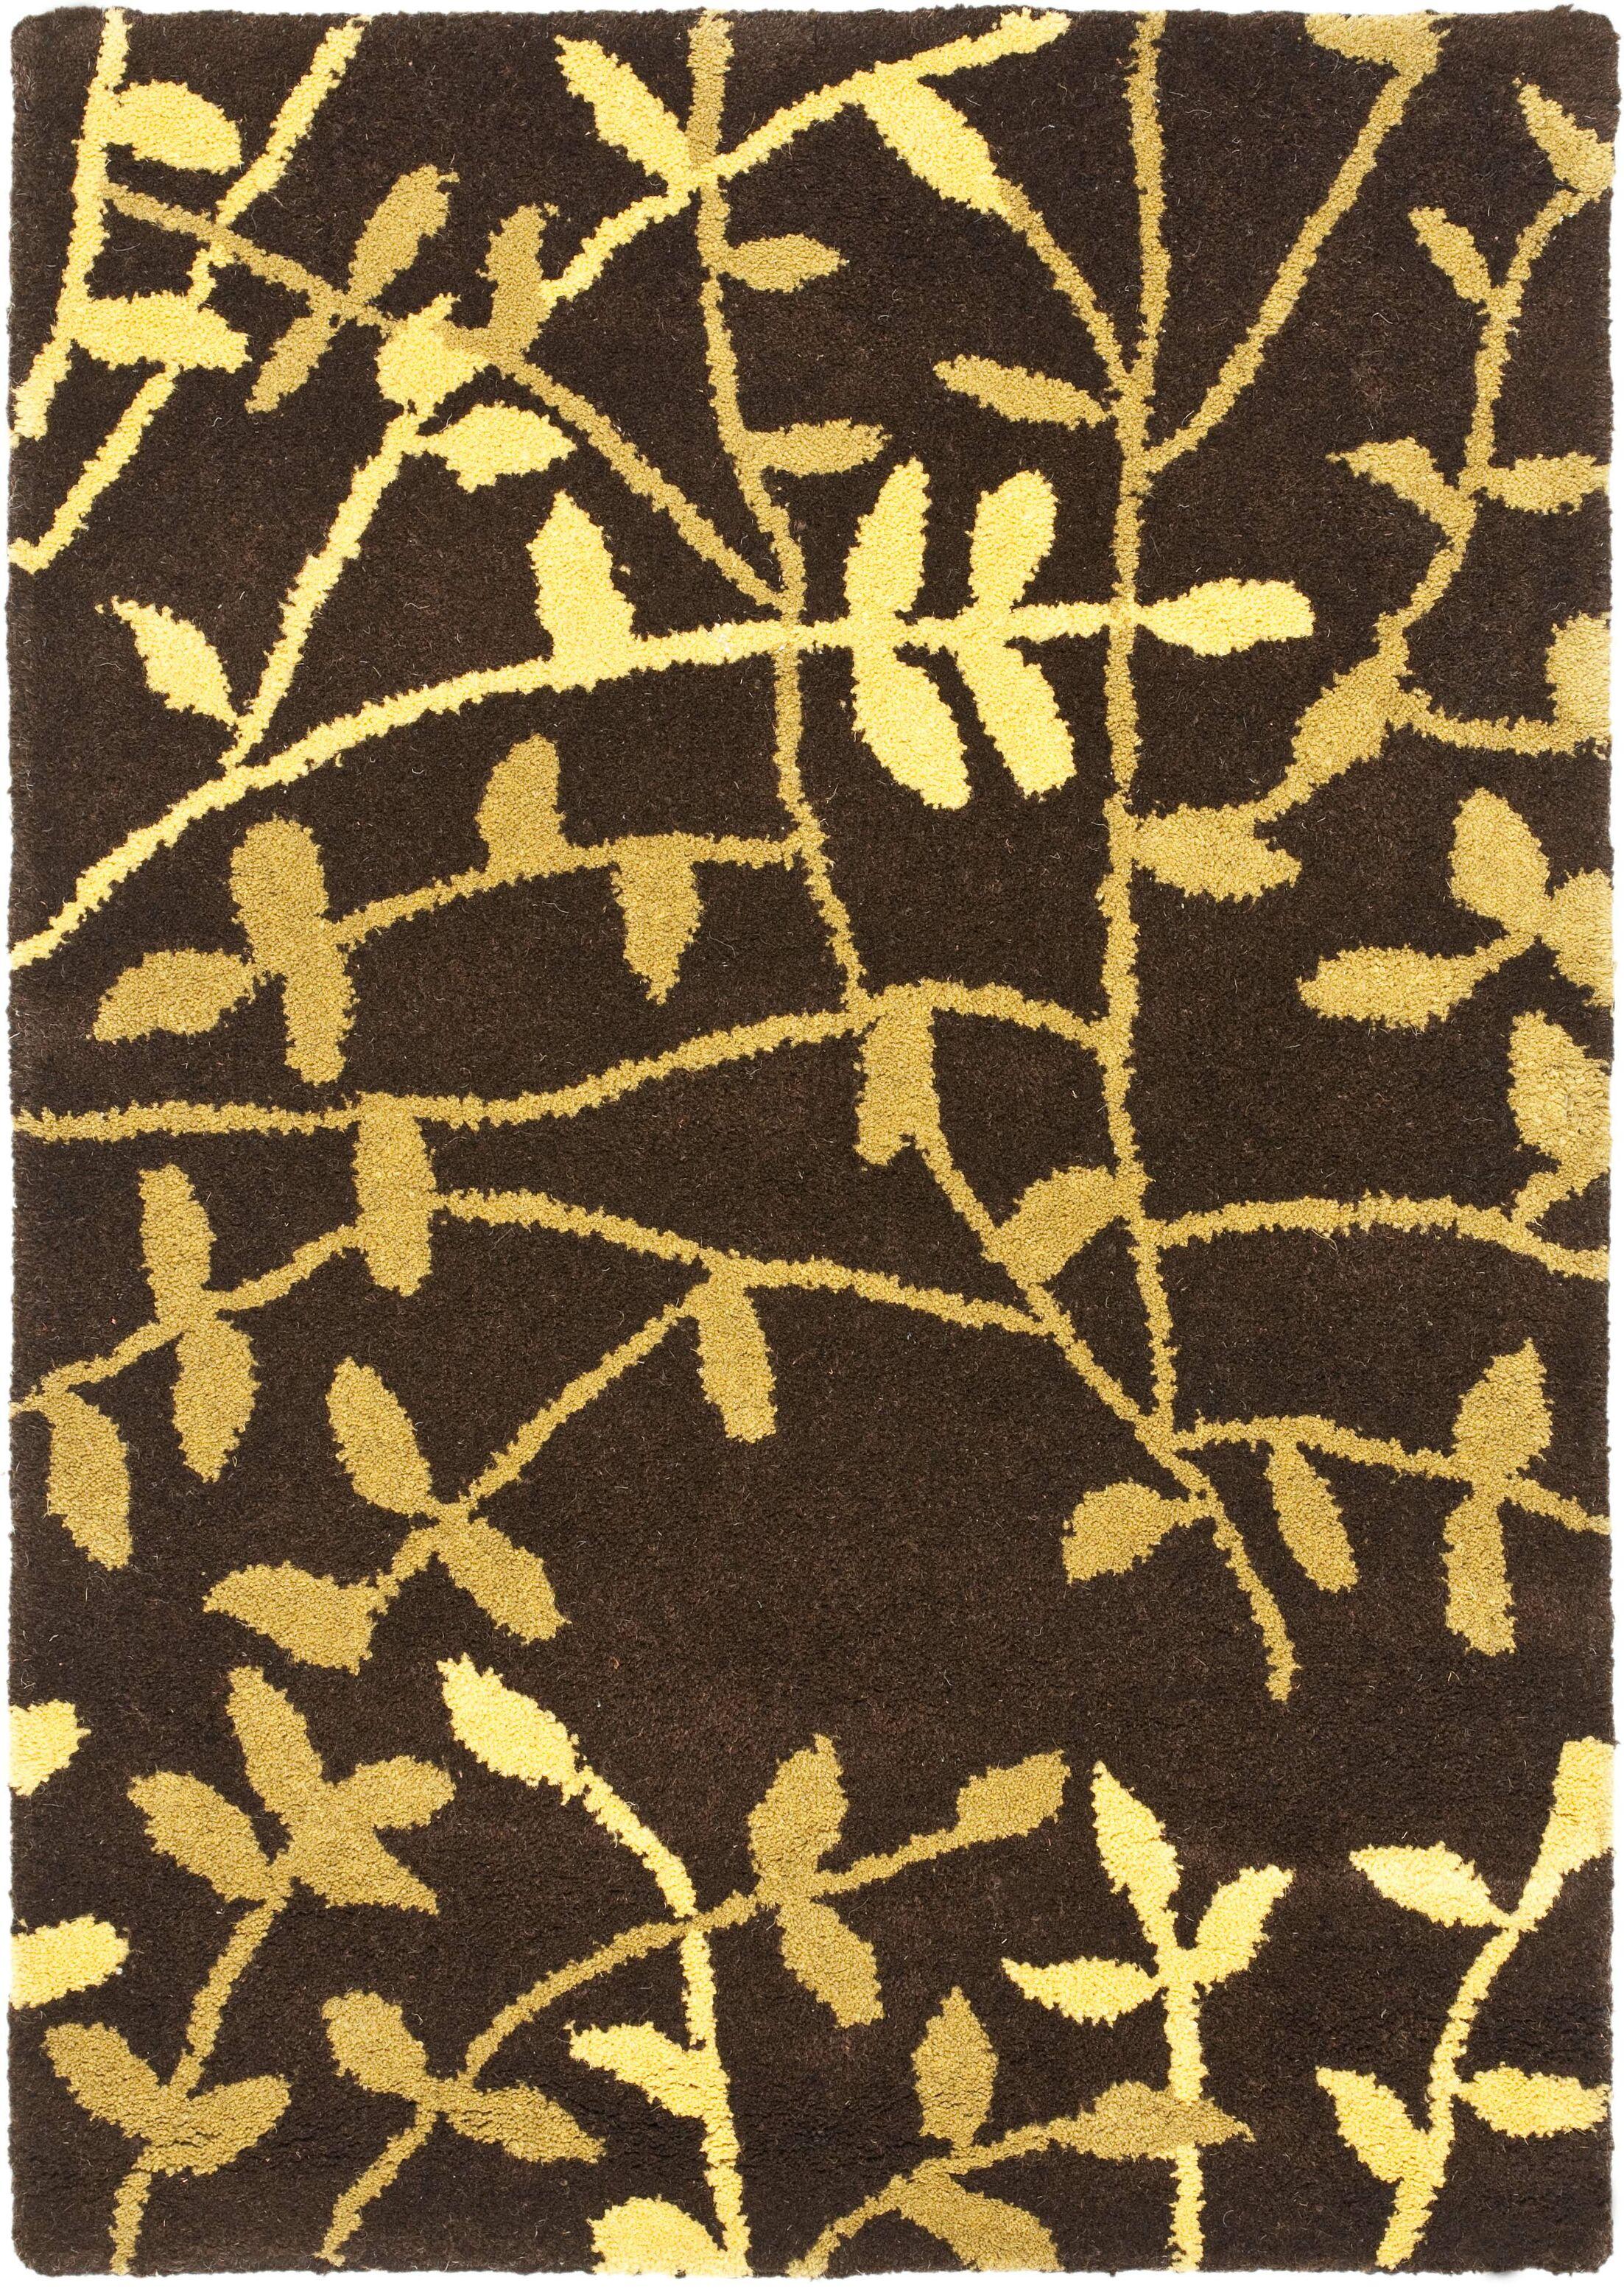 Lockwood Brown Leaves Area Rug Rug Size: Rectangle 5' x 8'